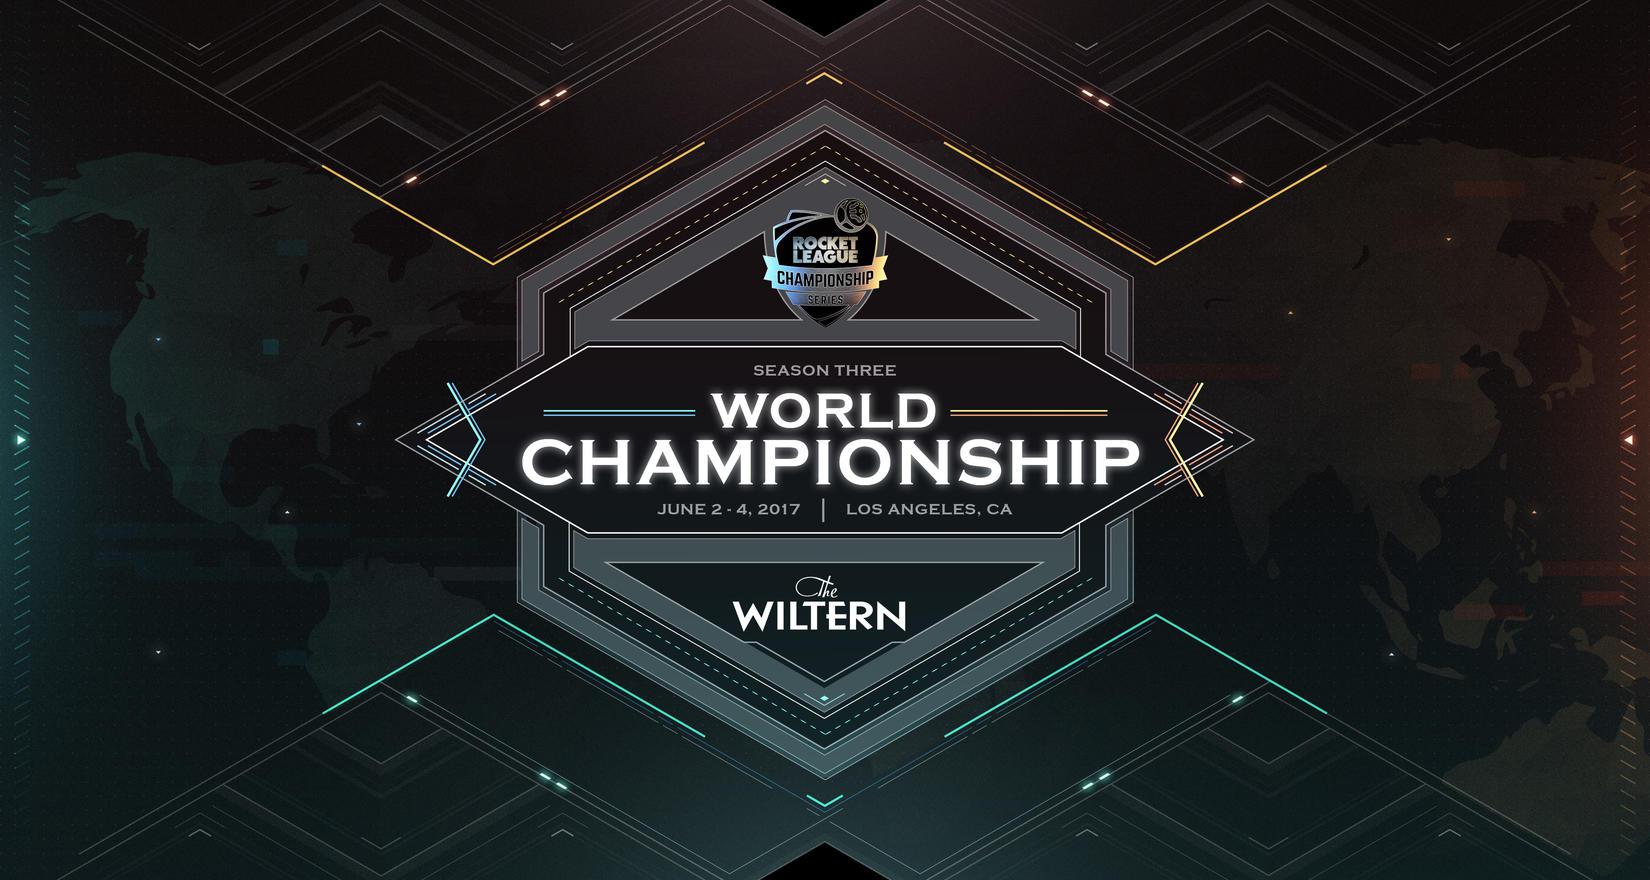 championship - photo #50